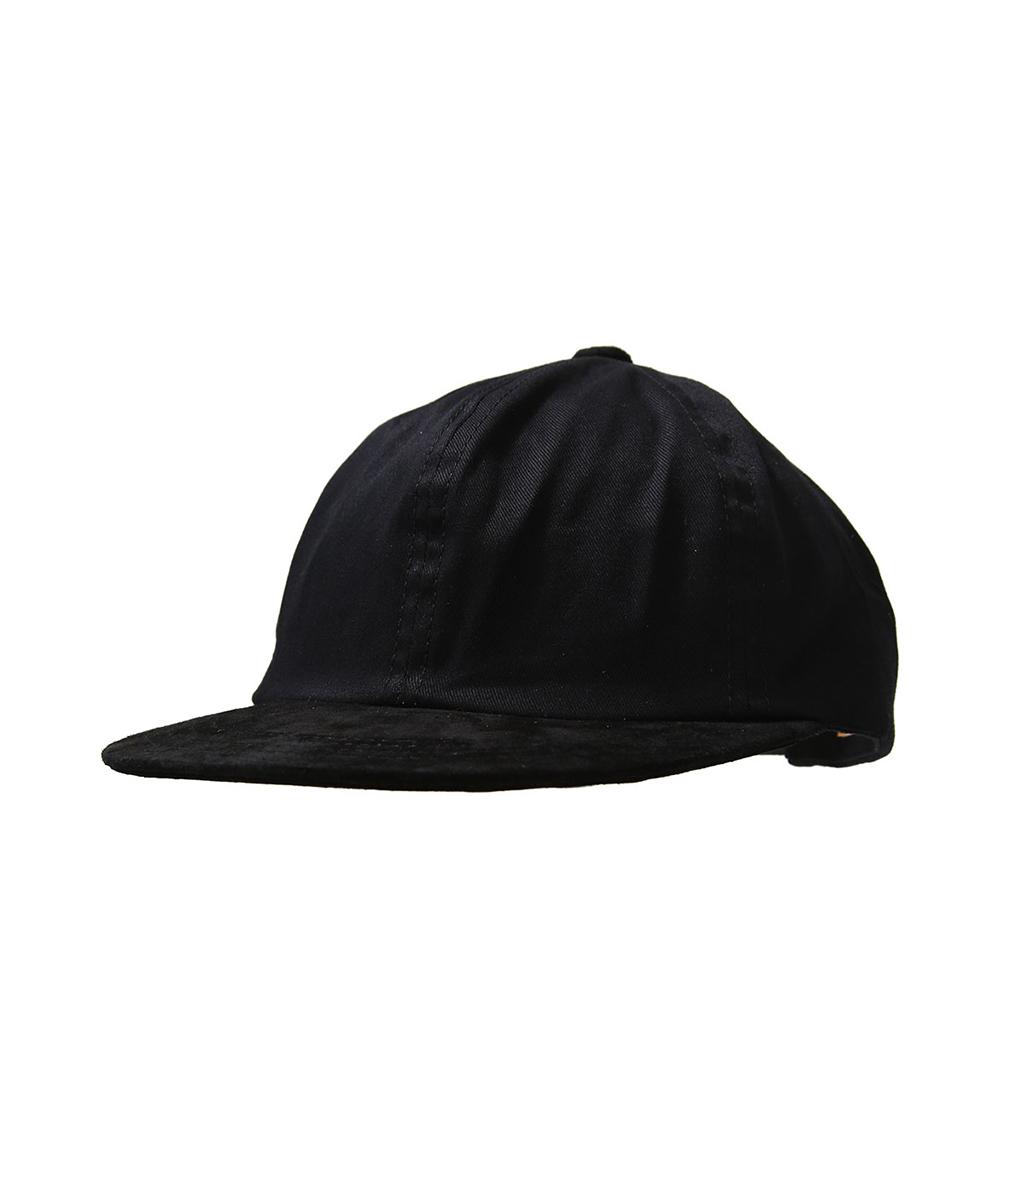 Hender Scheme / エンダースキーマ : 2 tone cap / 全3色 : エンダースキーマ 2トーン ツートーン 帽子 キャップ : nc-rc-ttc 【RIP】【BJB】